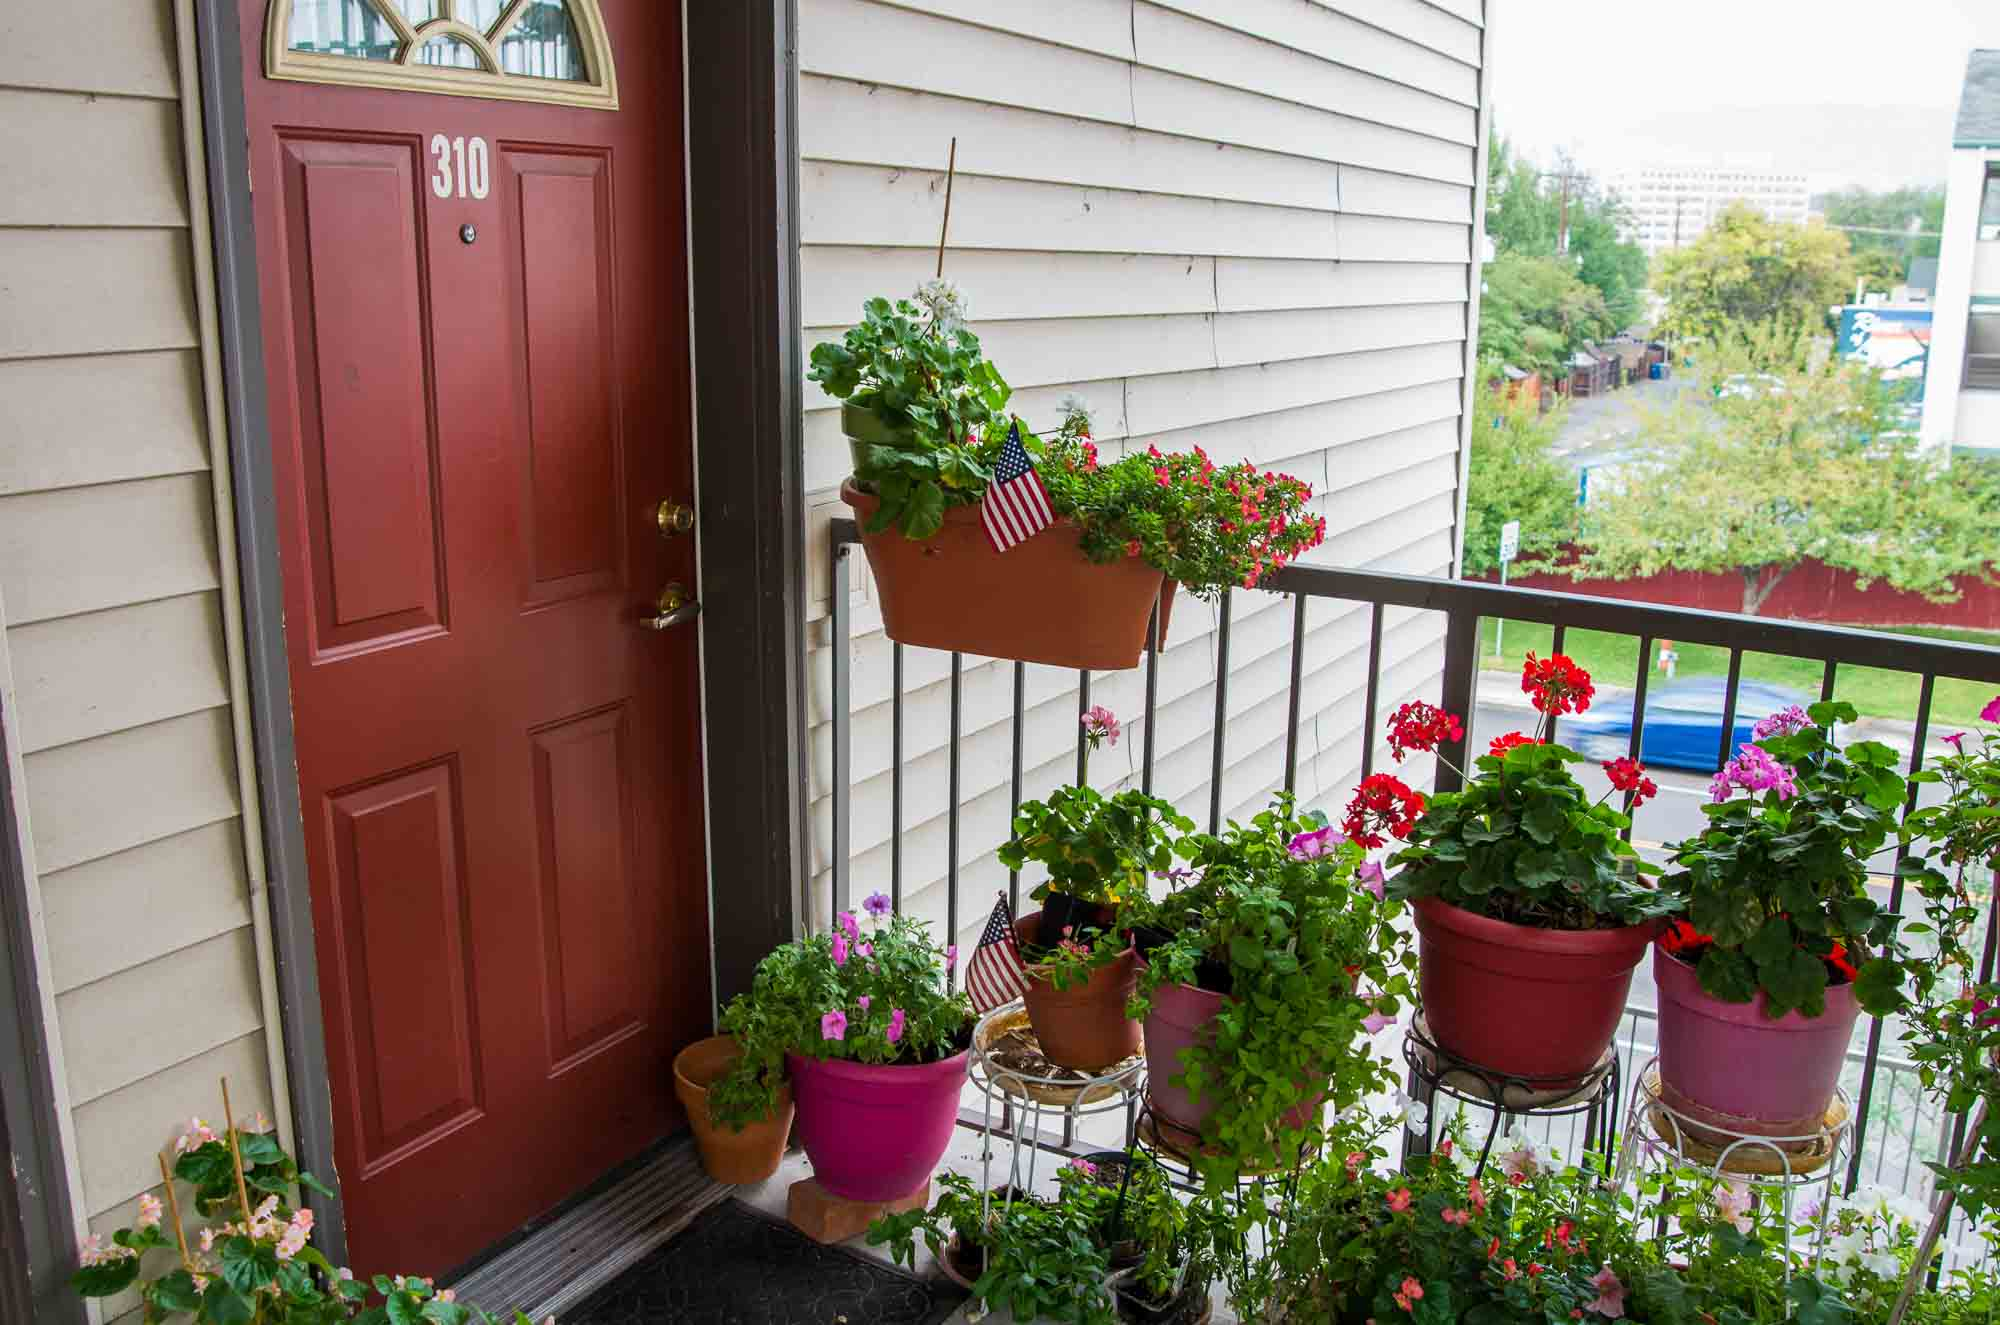 Housing Choice Voucher (Section 8) Waiting List Opening